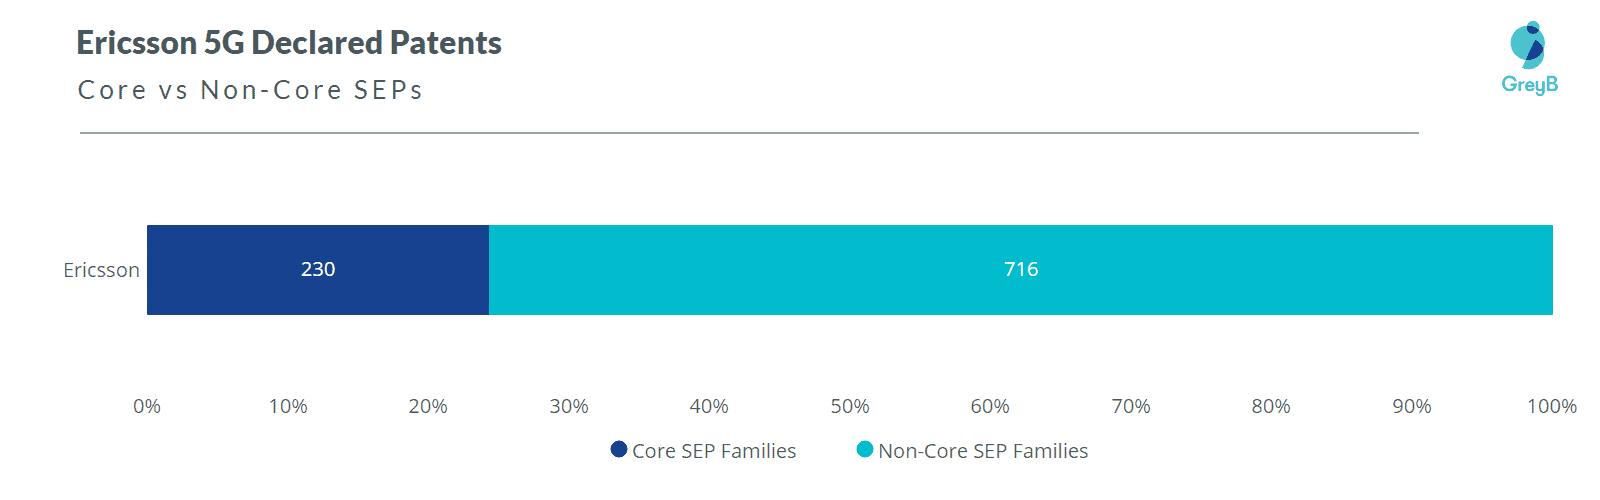 Ericsson 5G Core SEPs